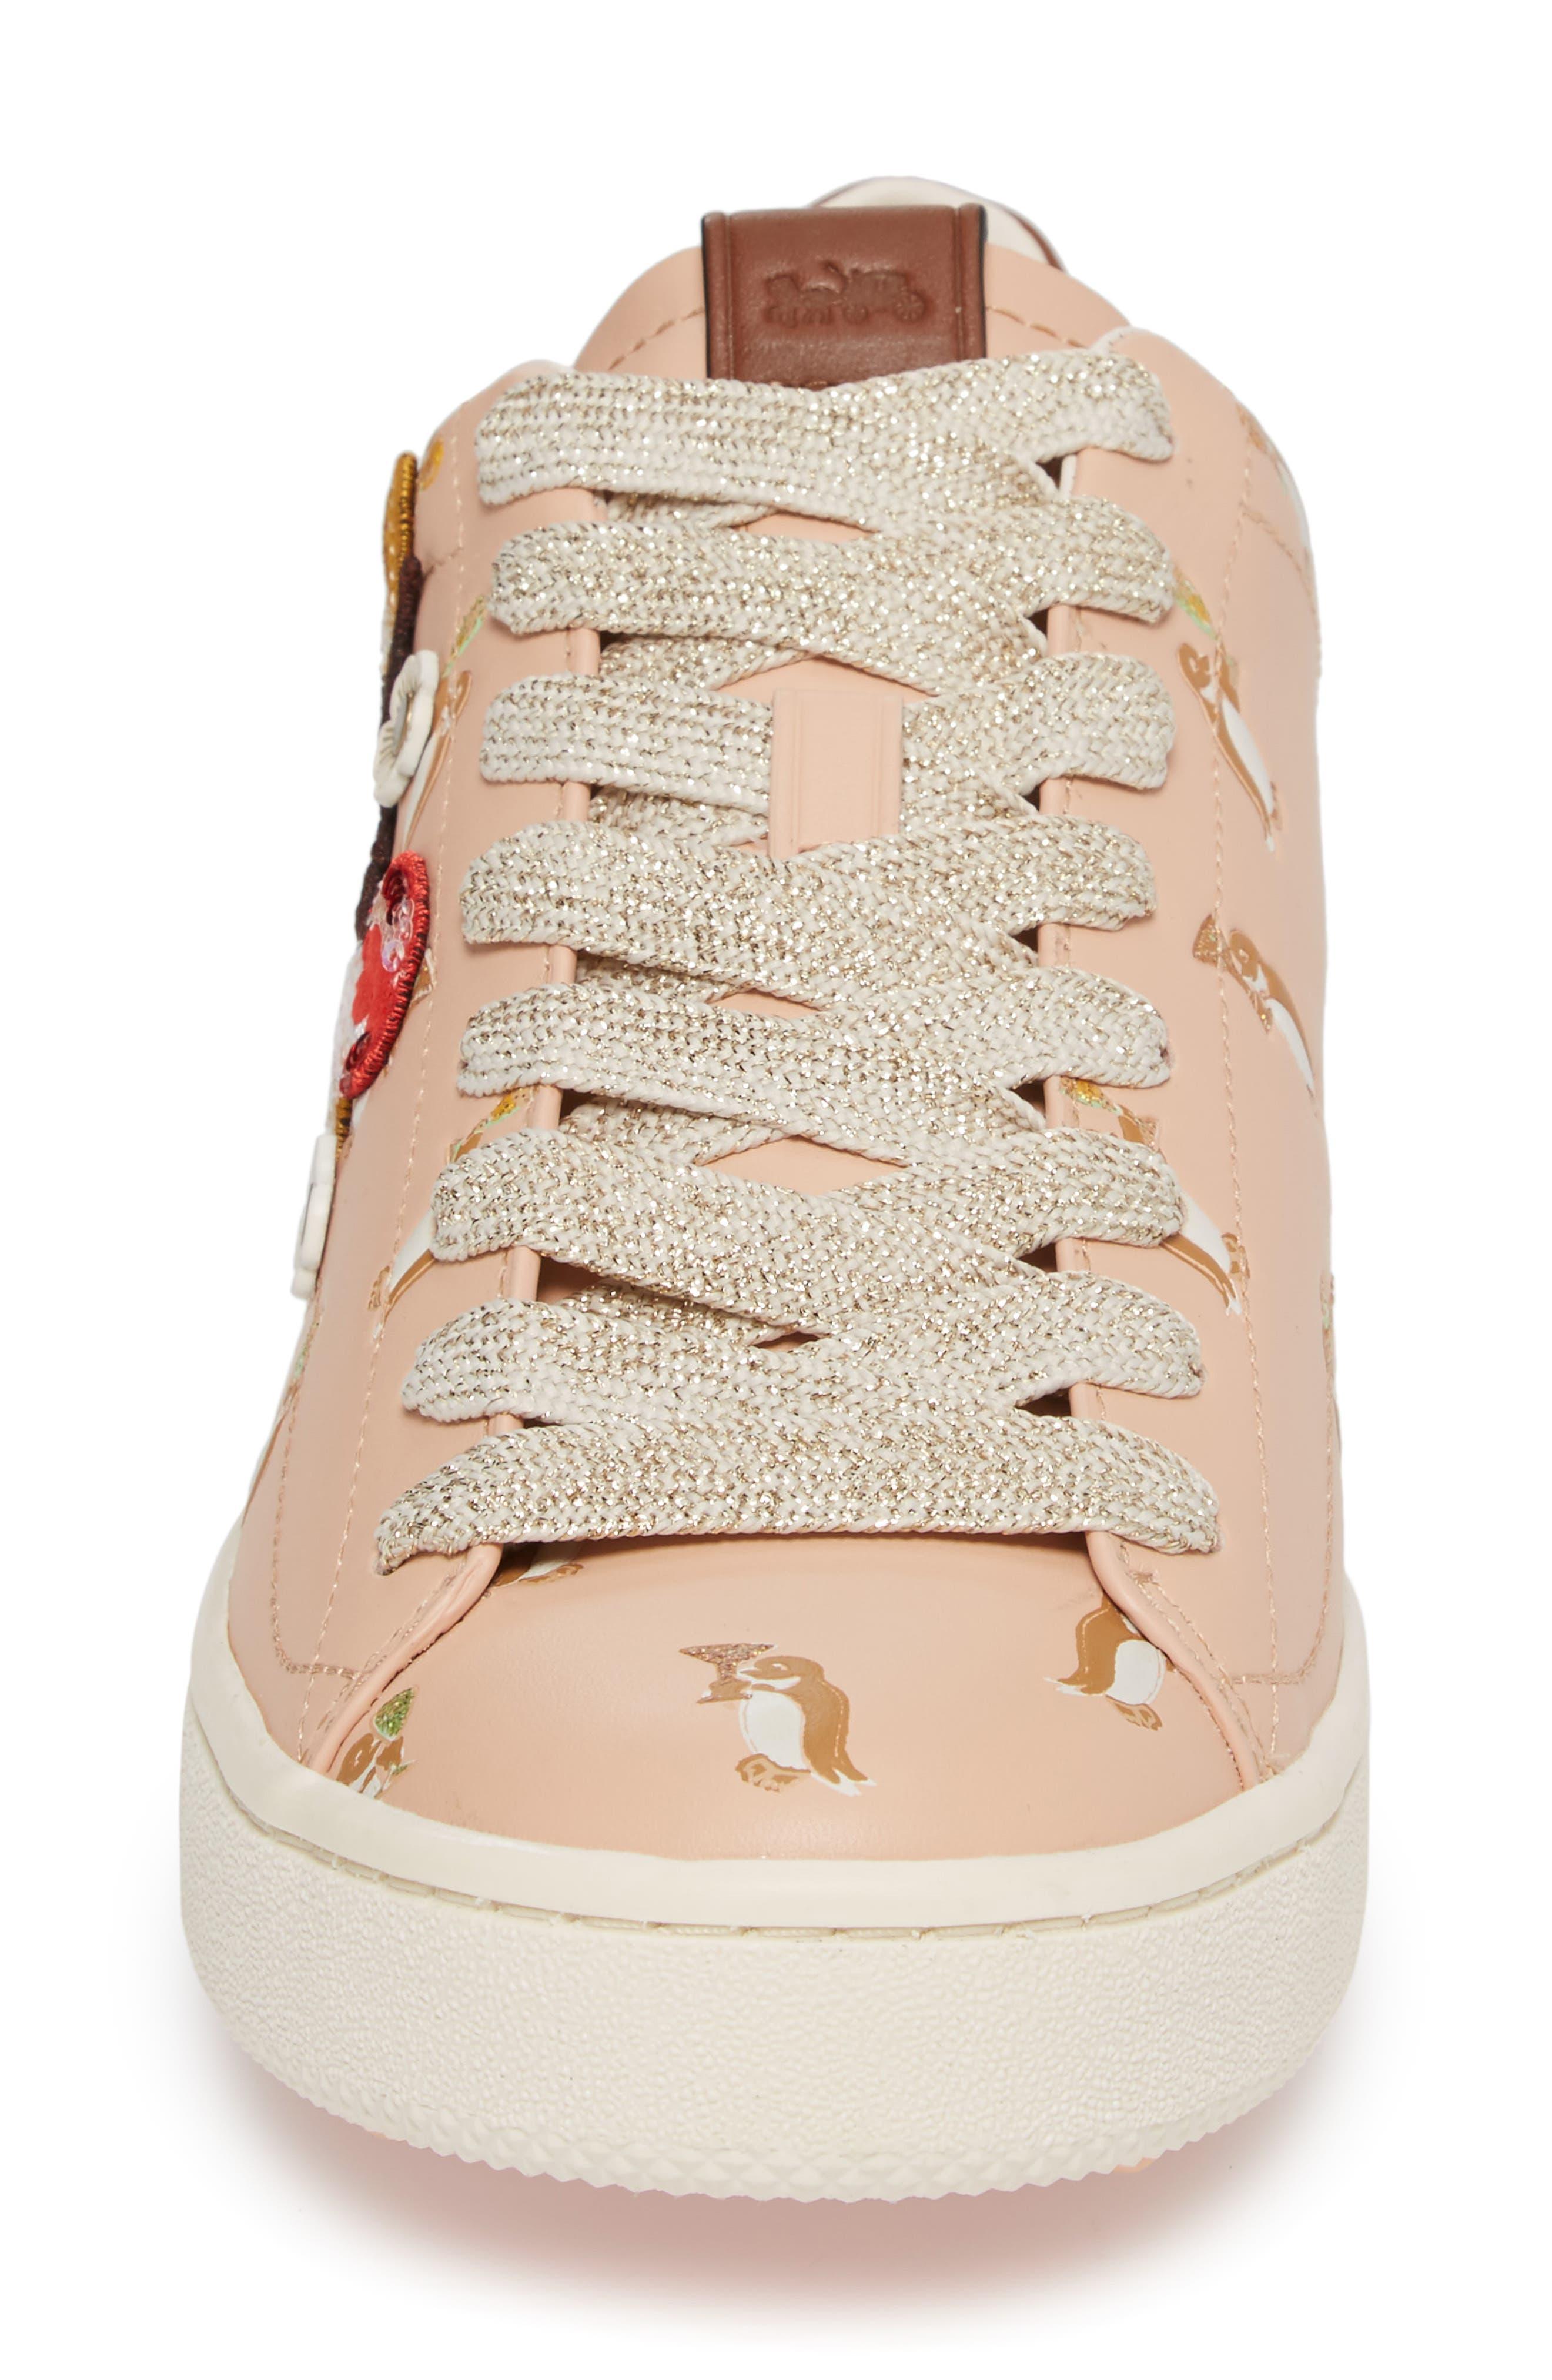 Patch Sneaker,                             Alternate thumbnail 4, color,                             650